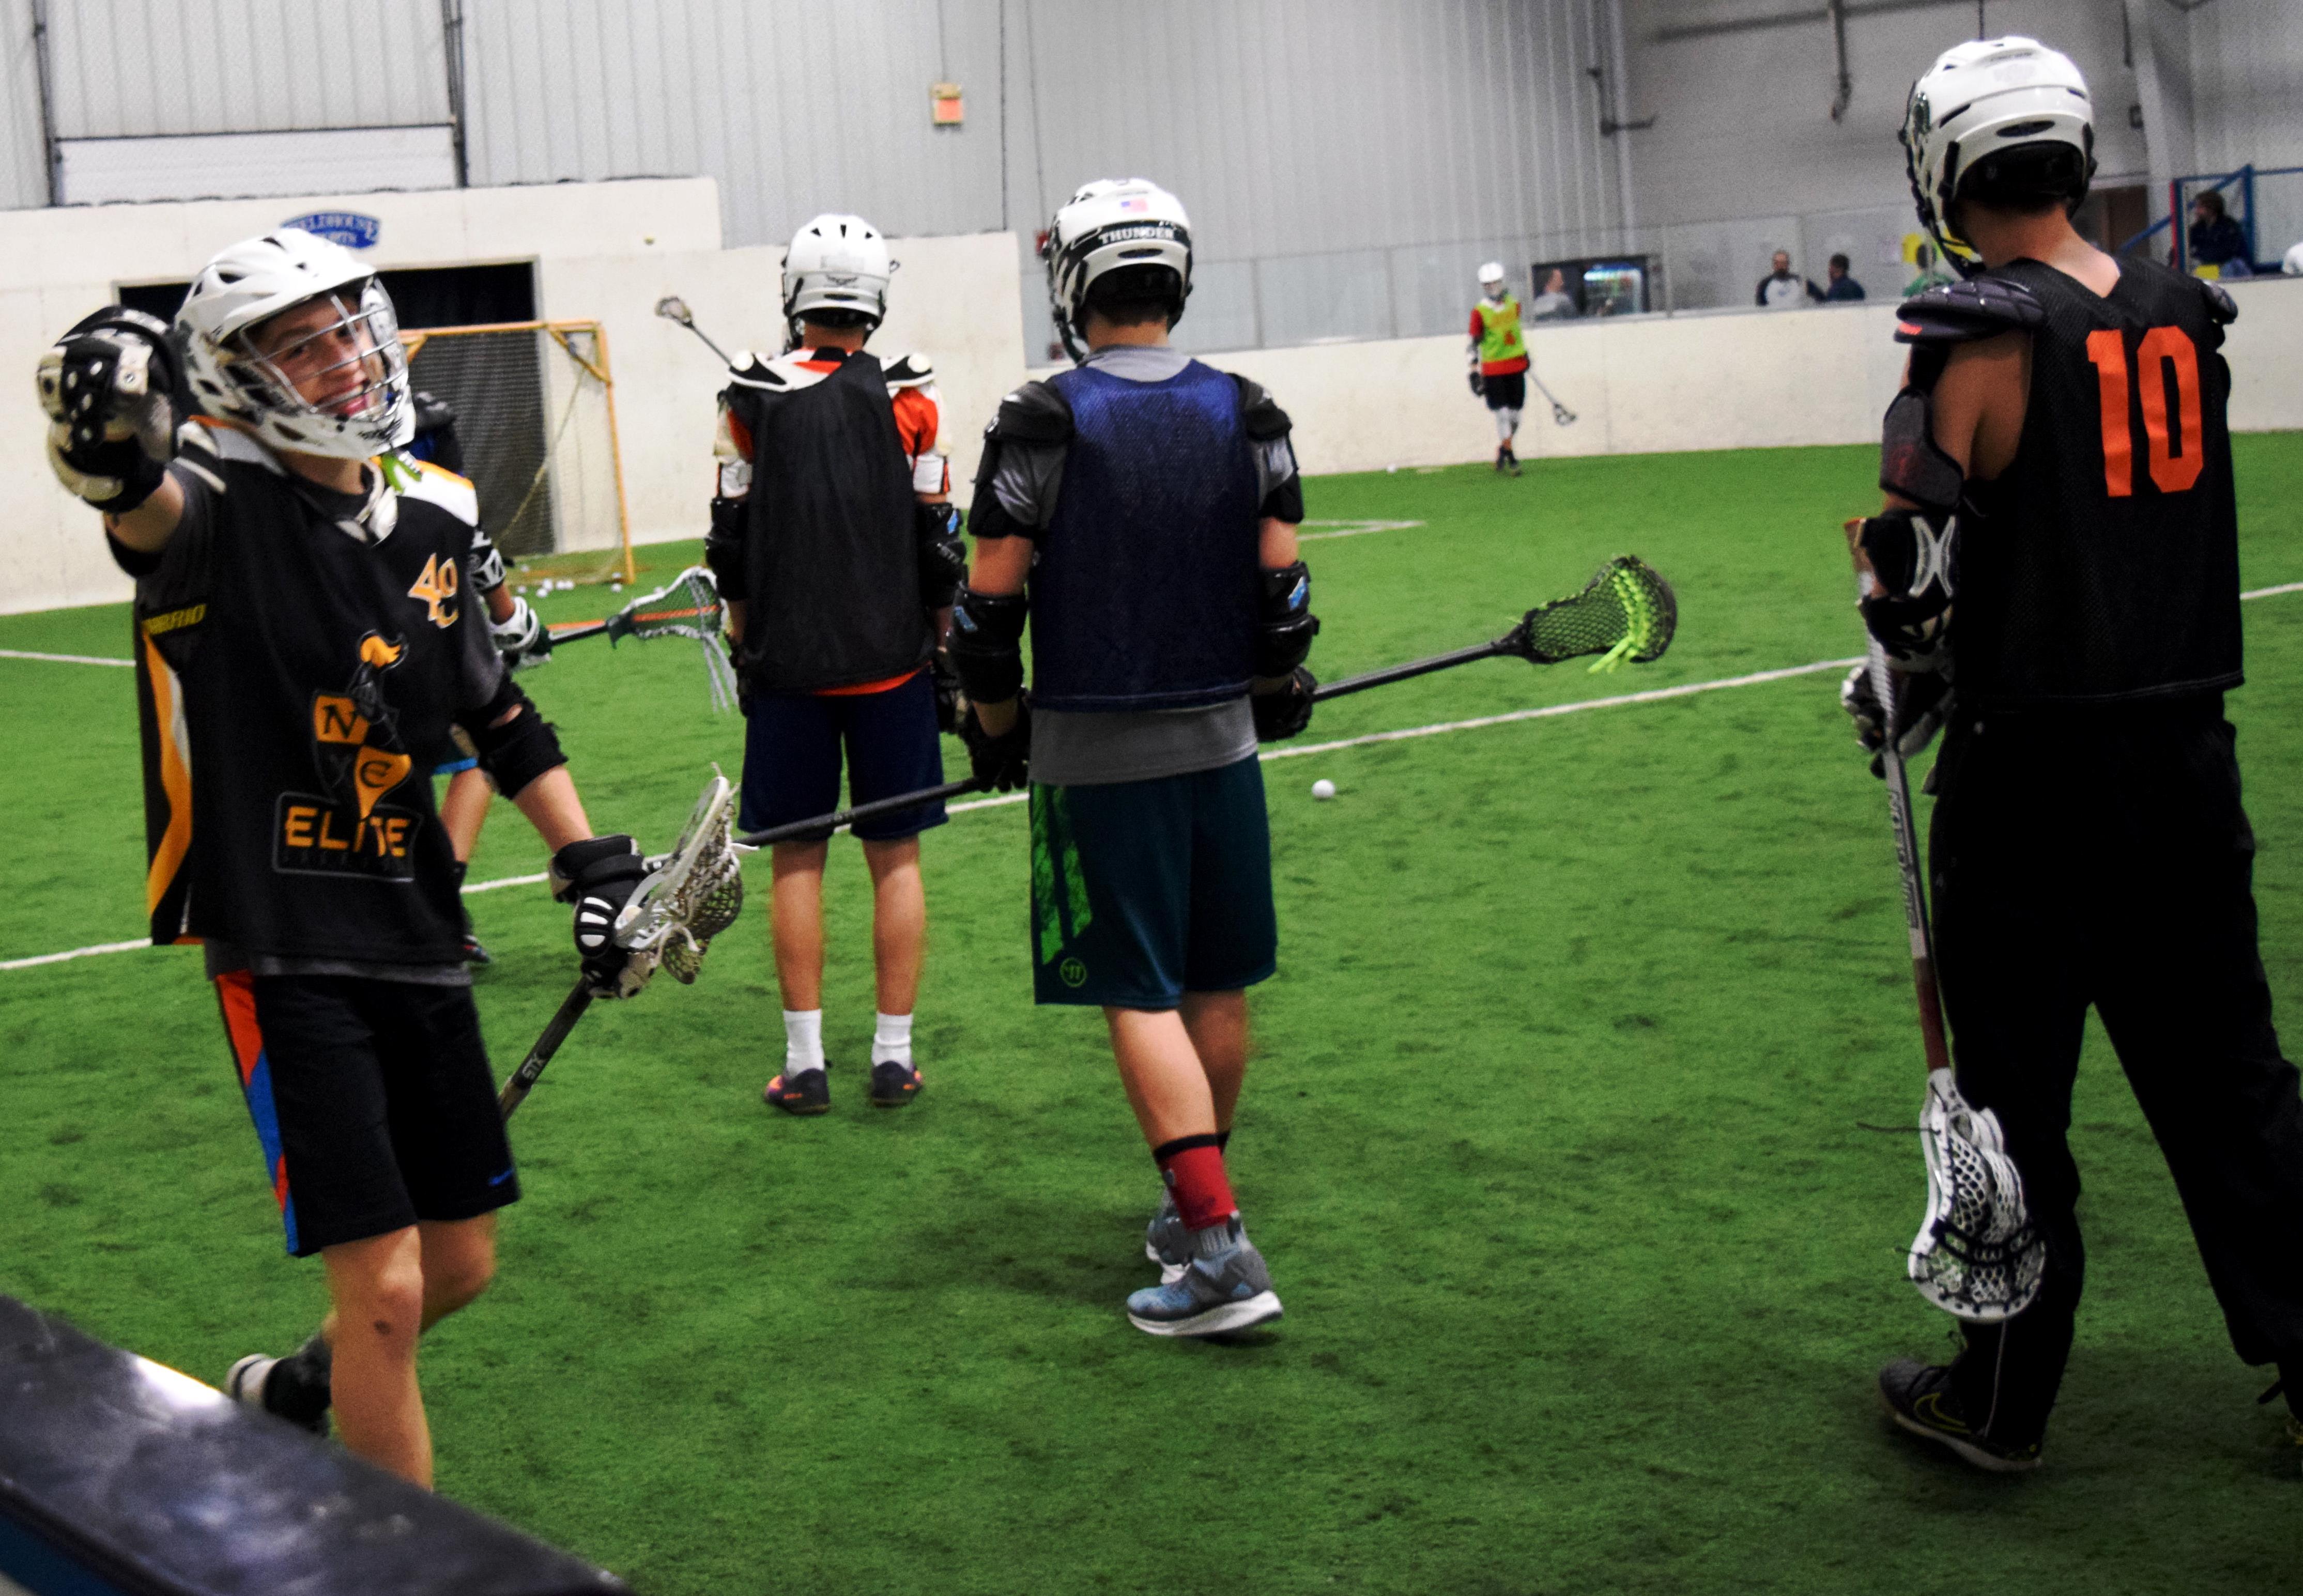 Lacrosse practice at FieldHouse